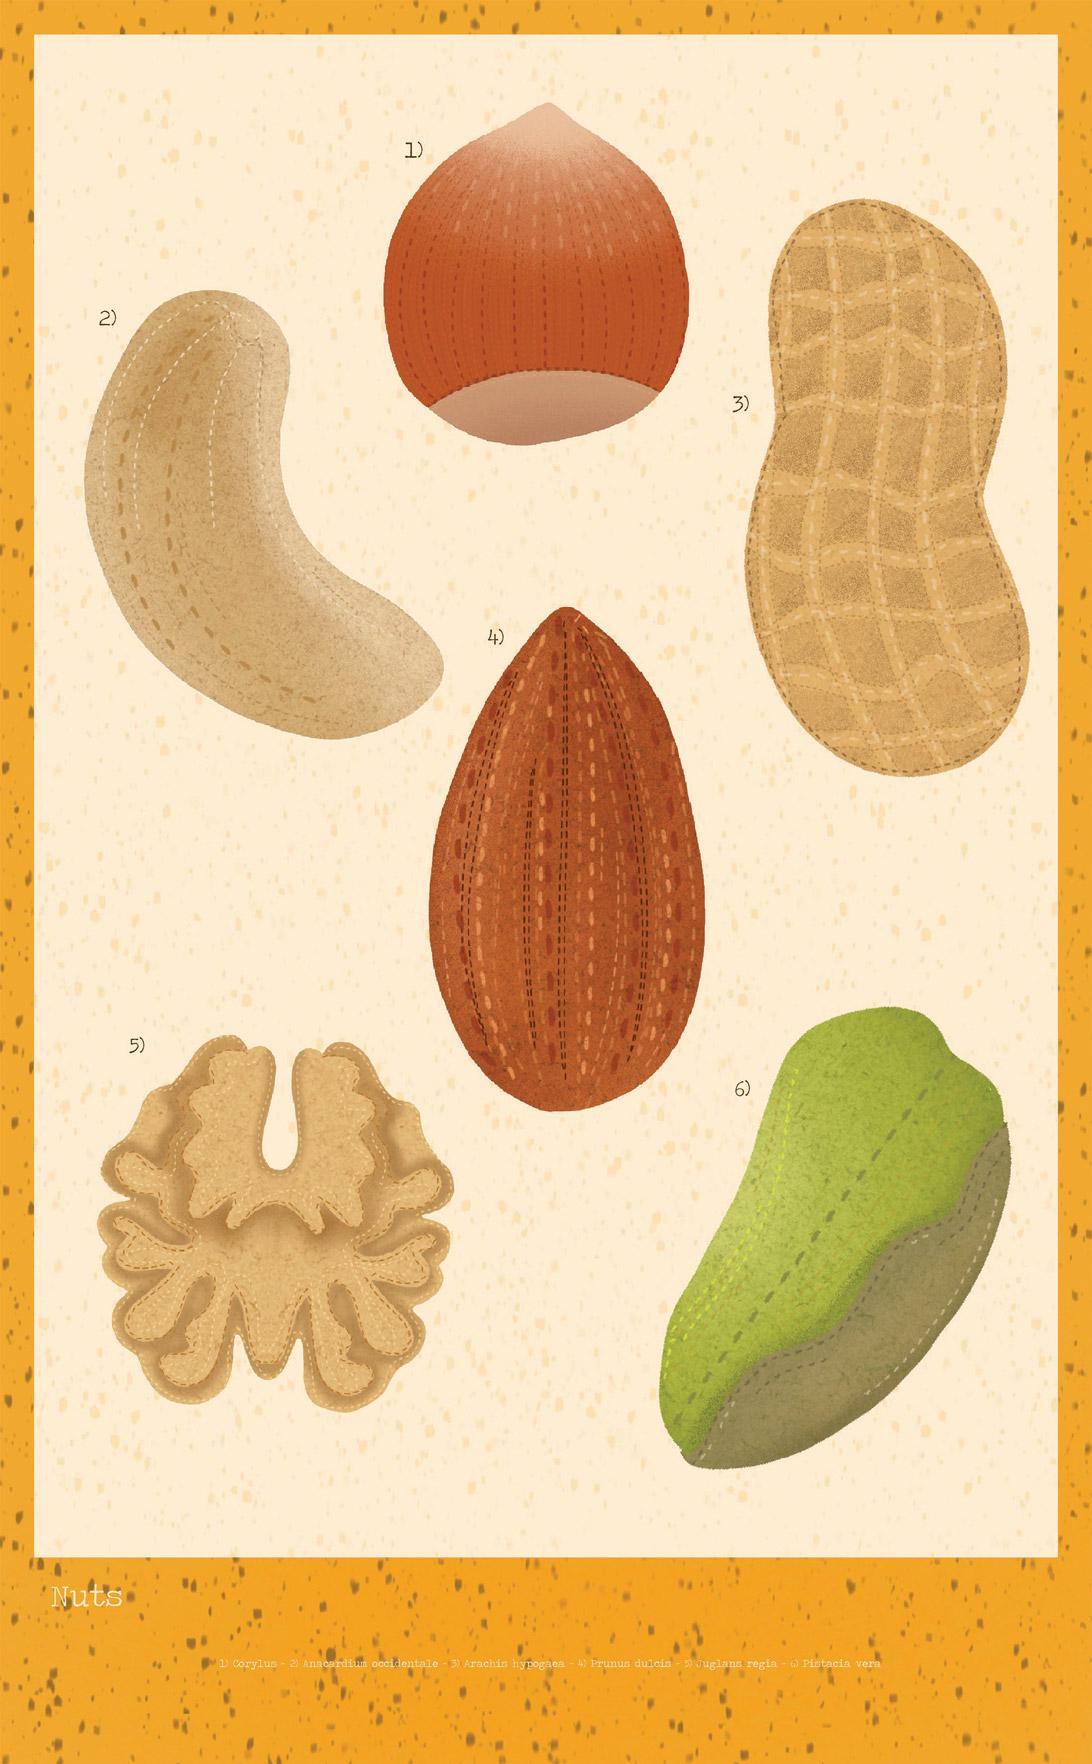 poster of nut illustrations